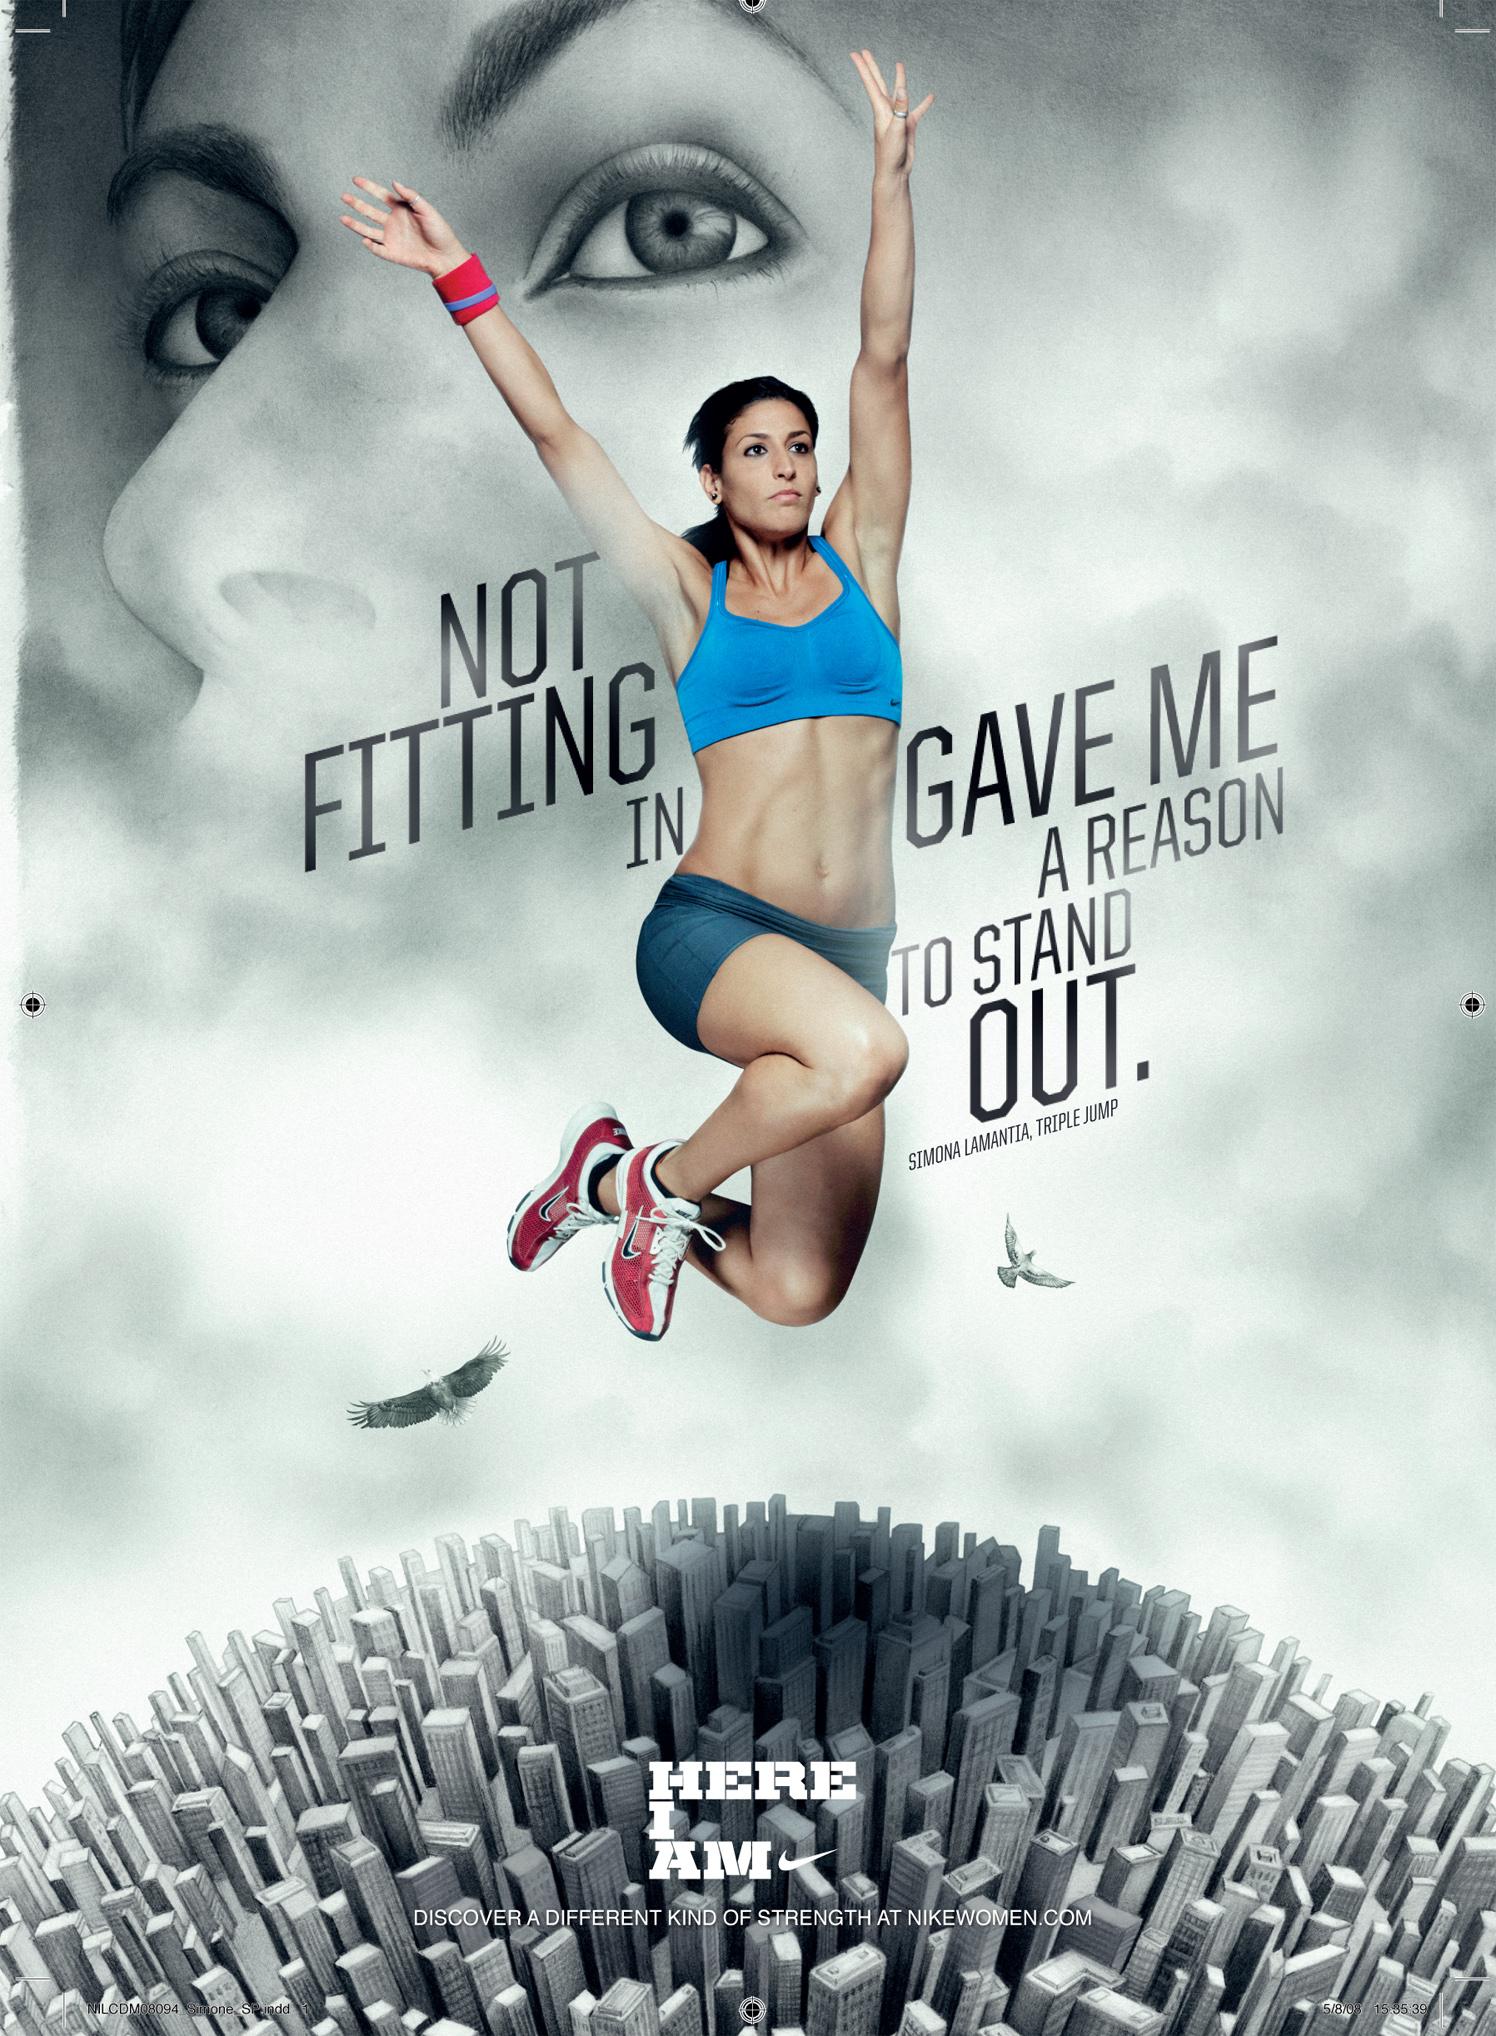 Woman Cloud Portrait On Nike Poster